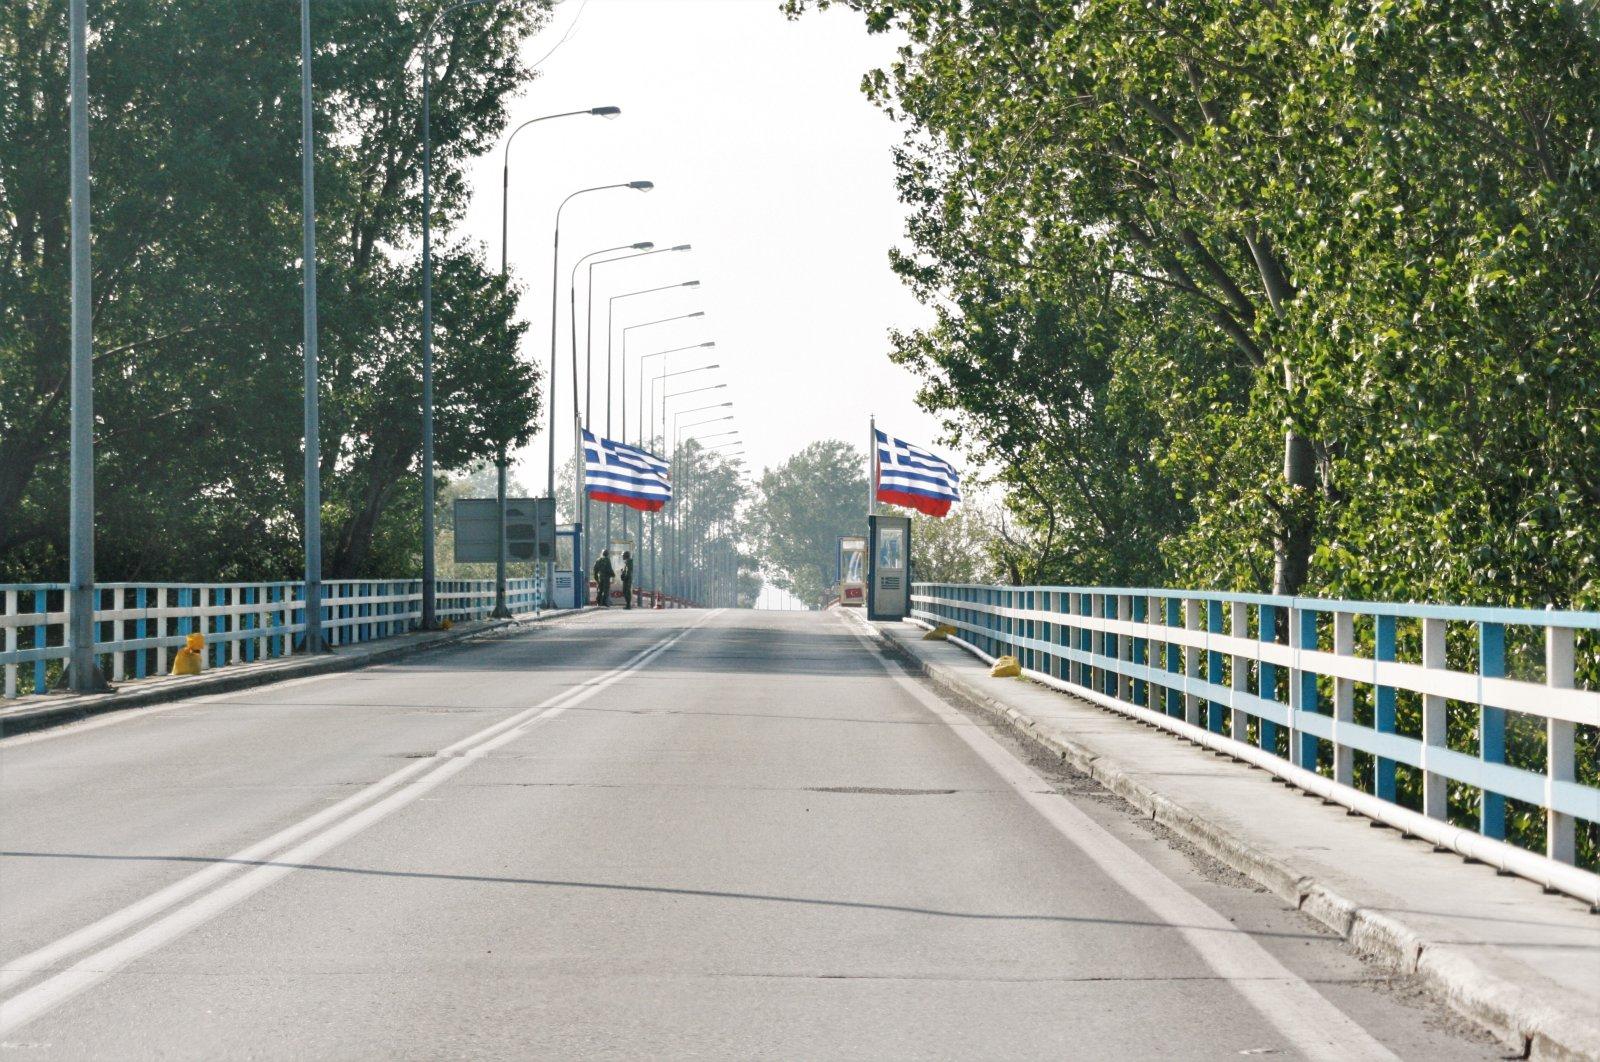 The Greek side of the Turkey-Greece border is seen in this photo taken in northwestern Edirne province, Turkey. (Shutterstock Photo)